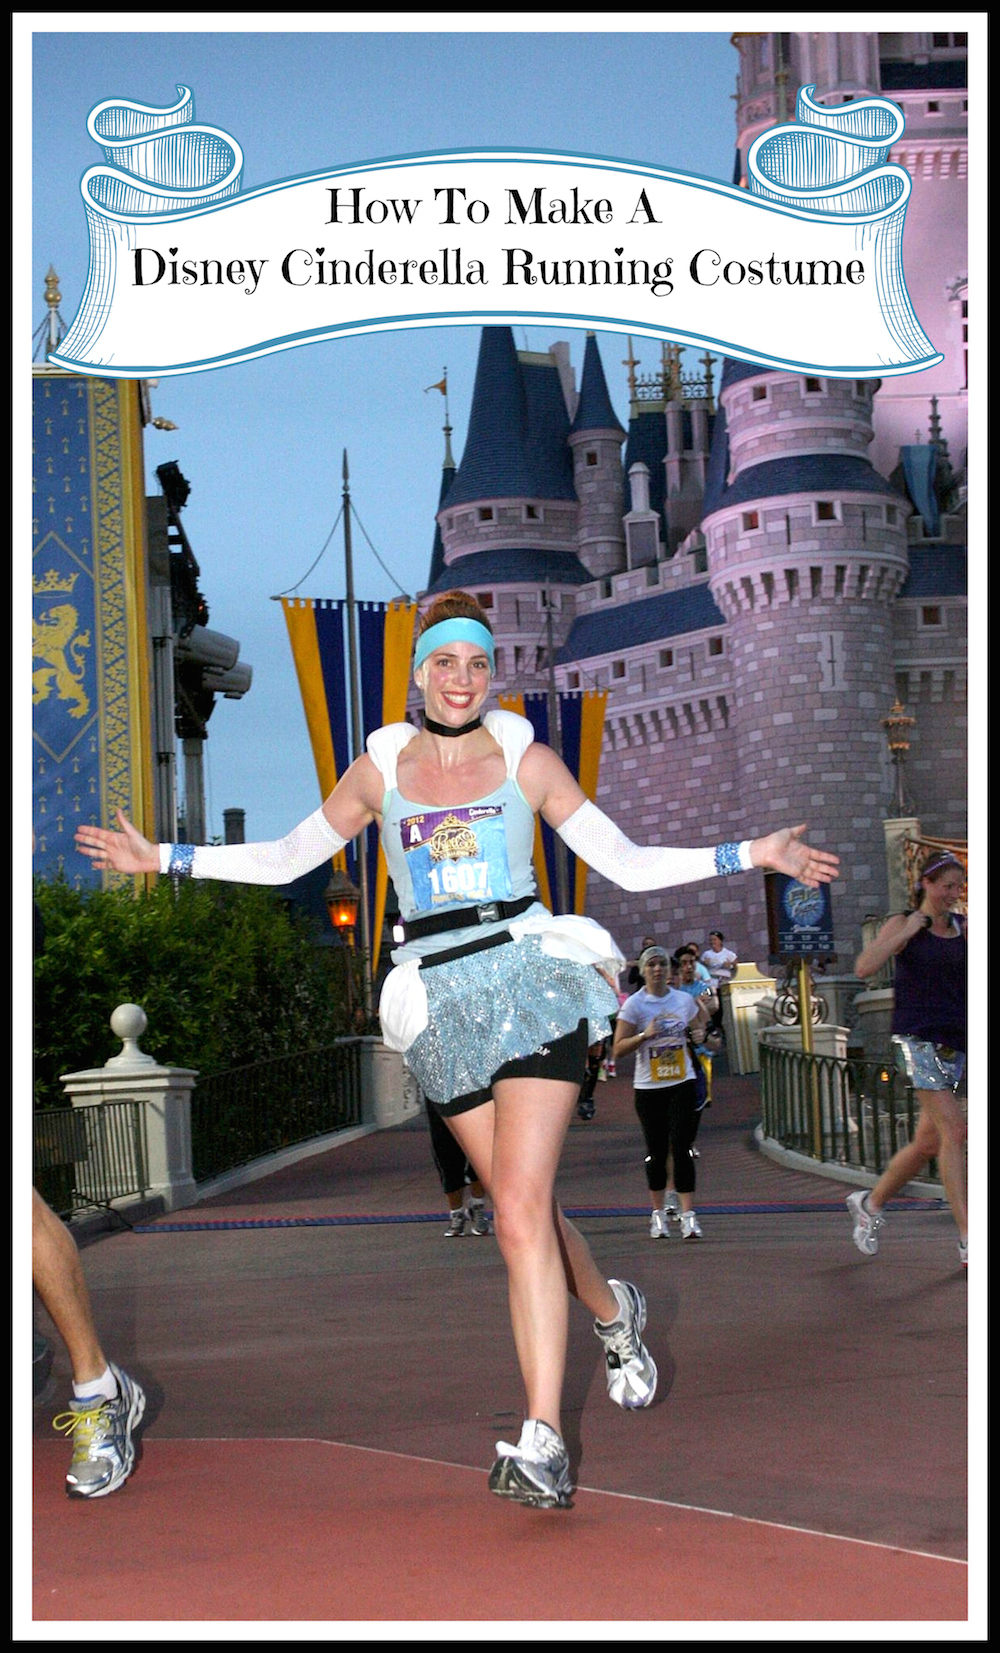 How to Make Cinderella u0026 Prince Charming Disney Running Costumes  sc 1 st  Run Karla Run! & Cinderella Running Costume Poster  Run Karla Run!   Run Karla Run!